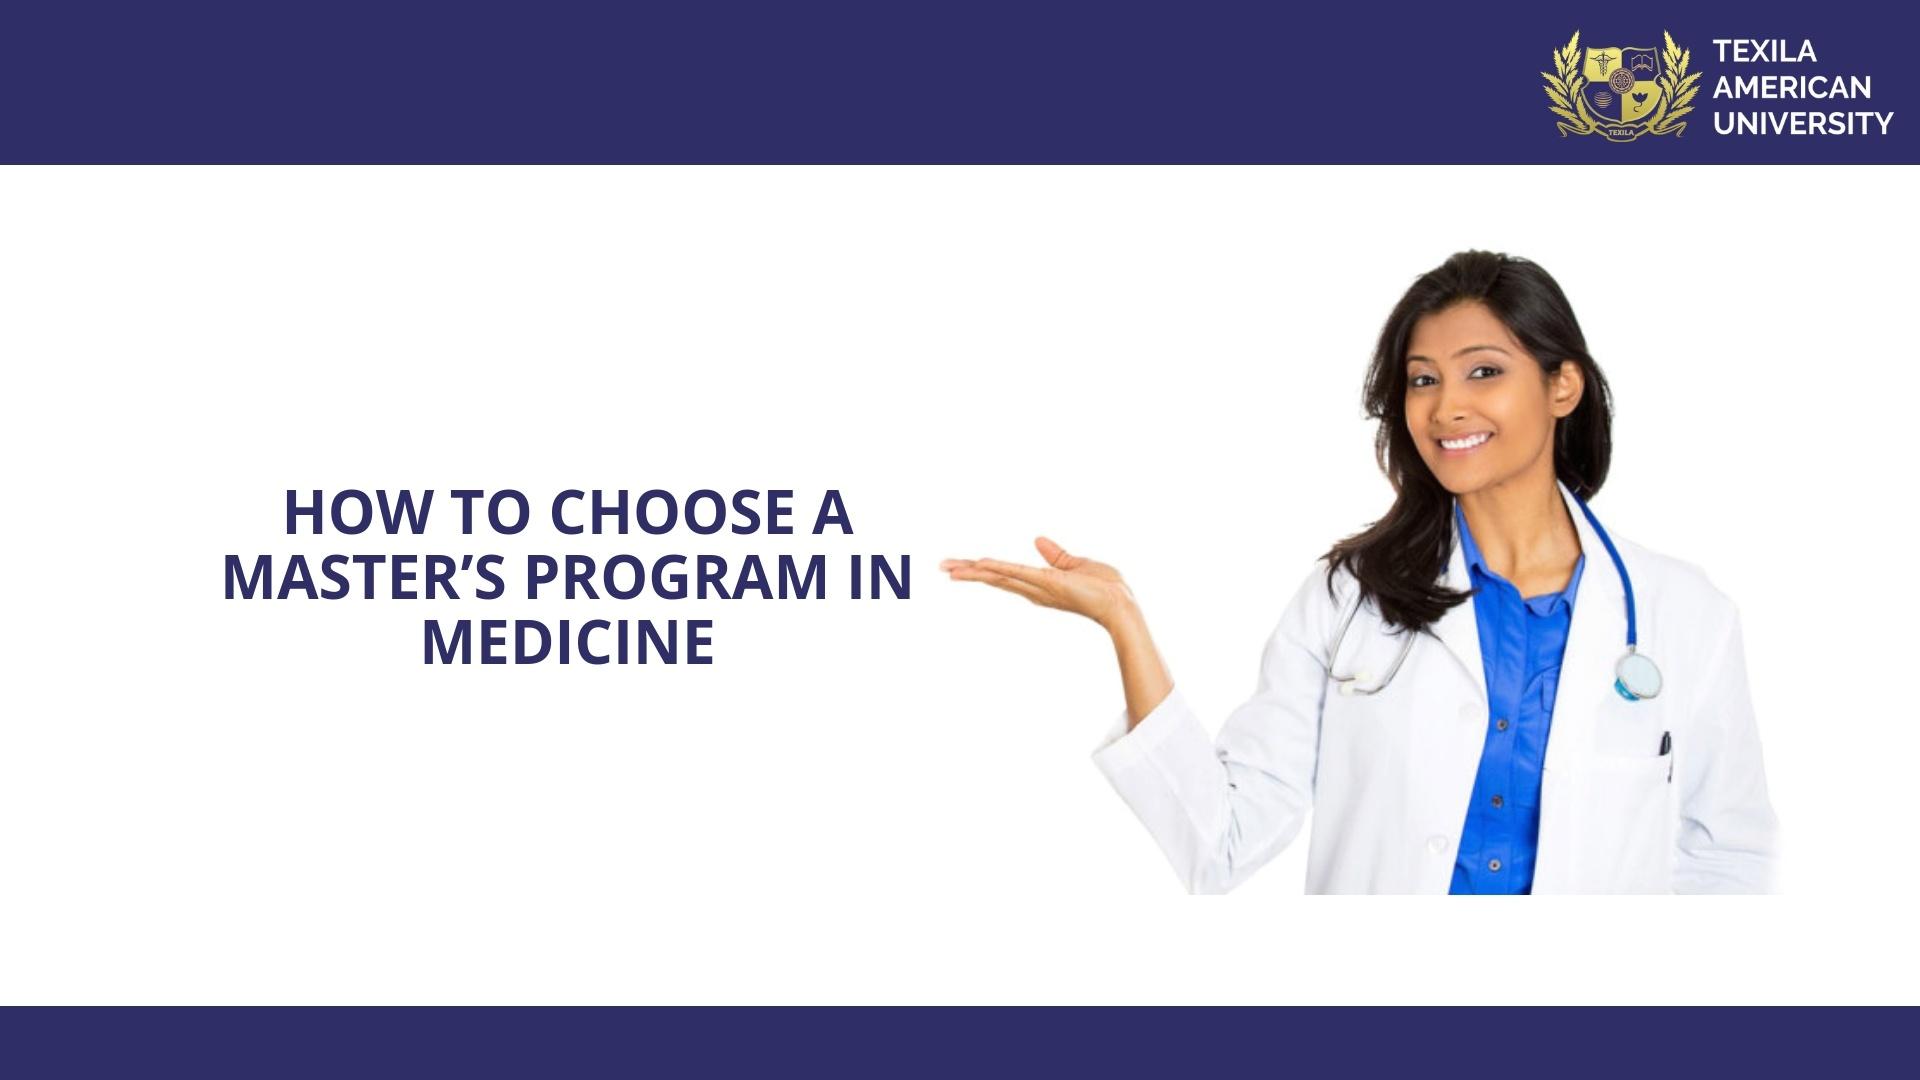 Masters program in Medicine